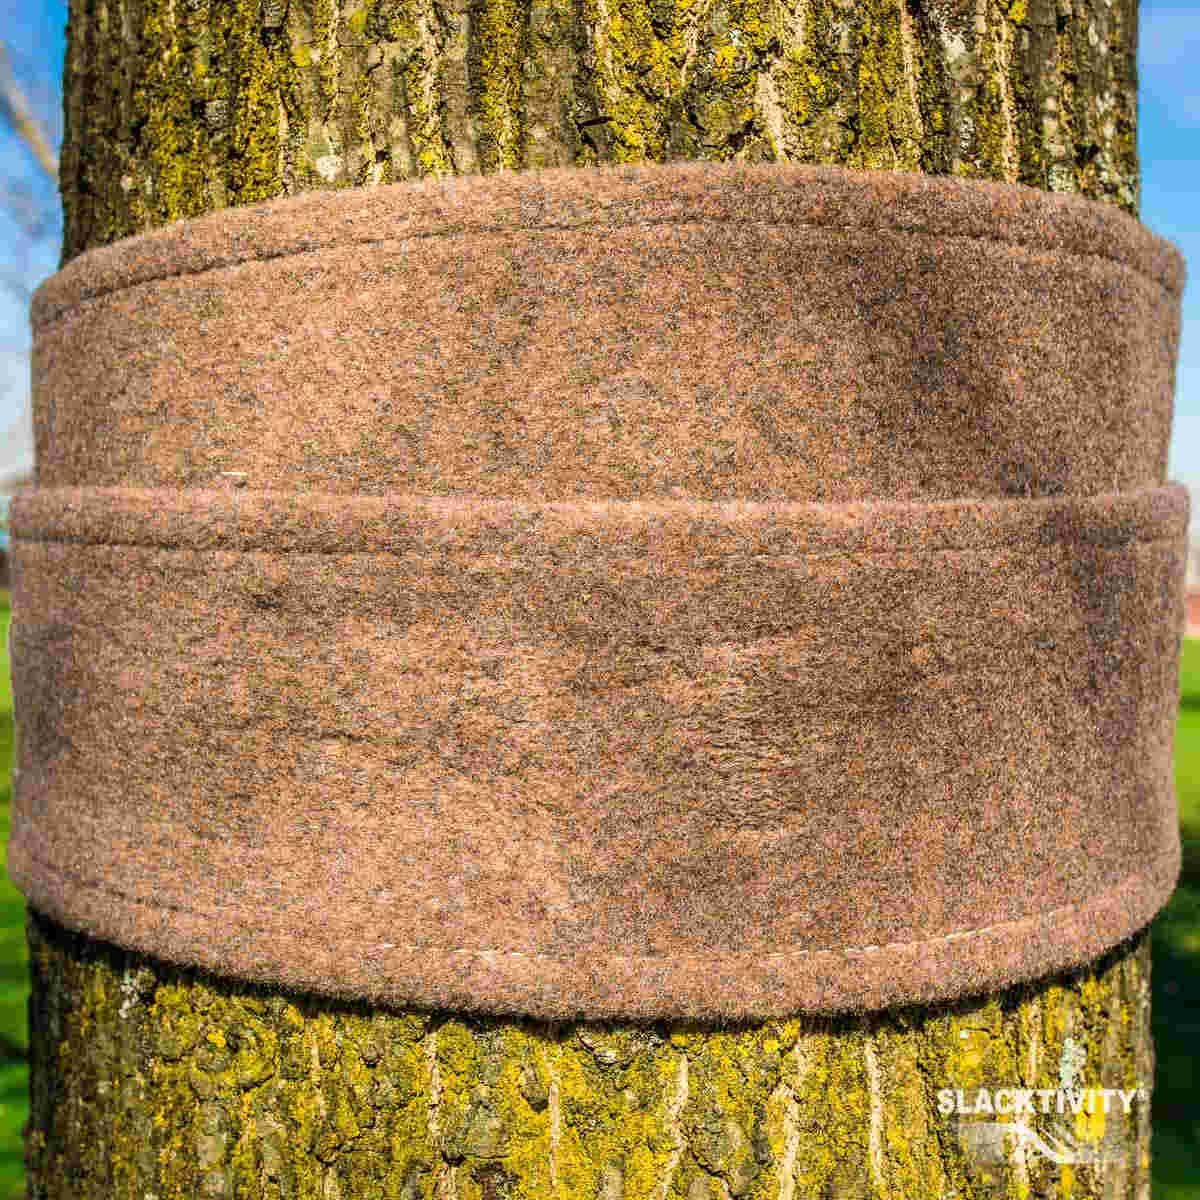 treeprotections set for slackline